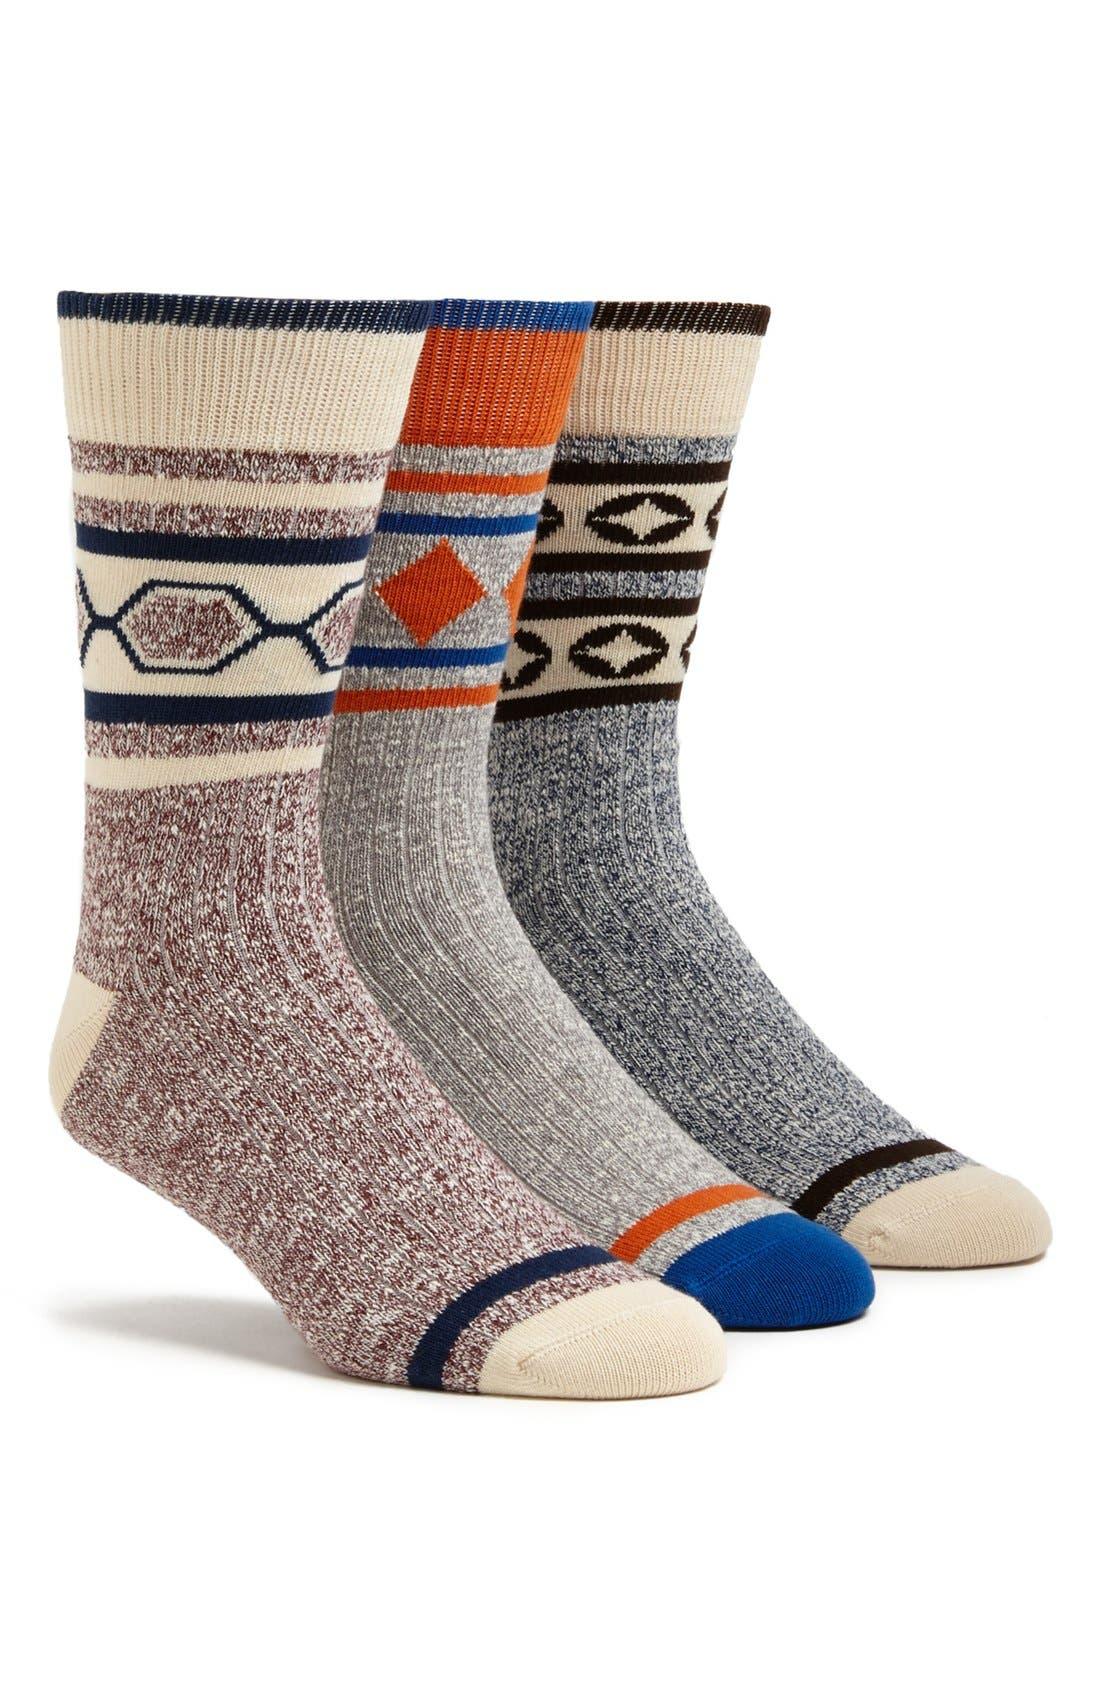 Alternate Image 1 Selected - Pact 'Camp' Socks (3-Pack)